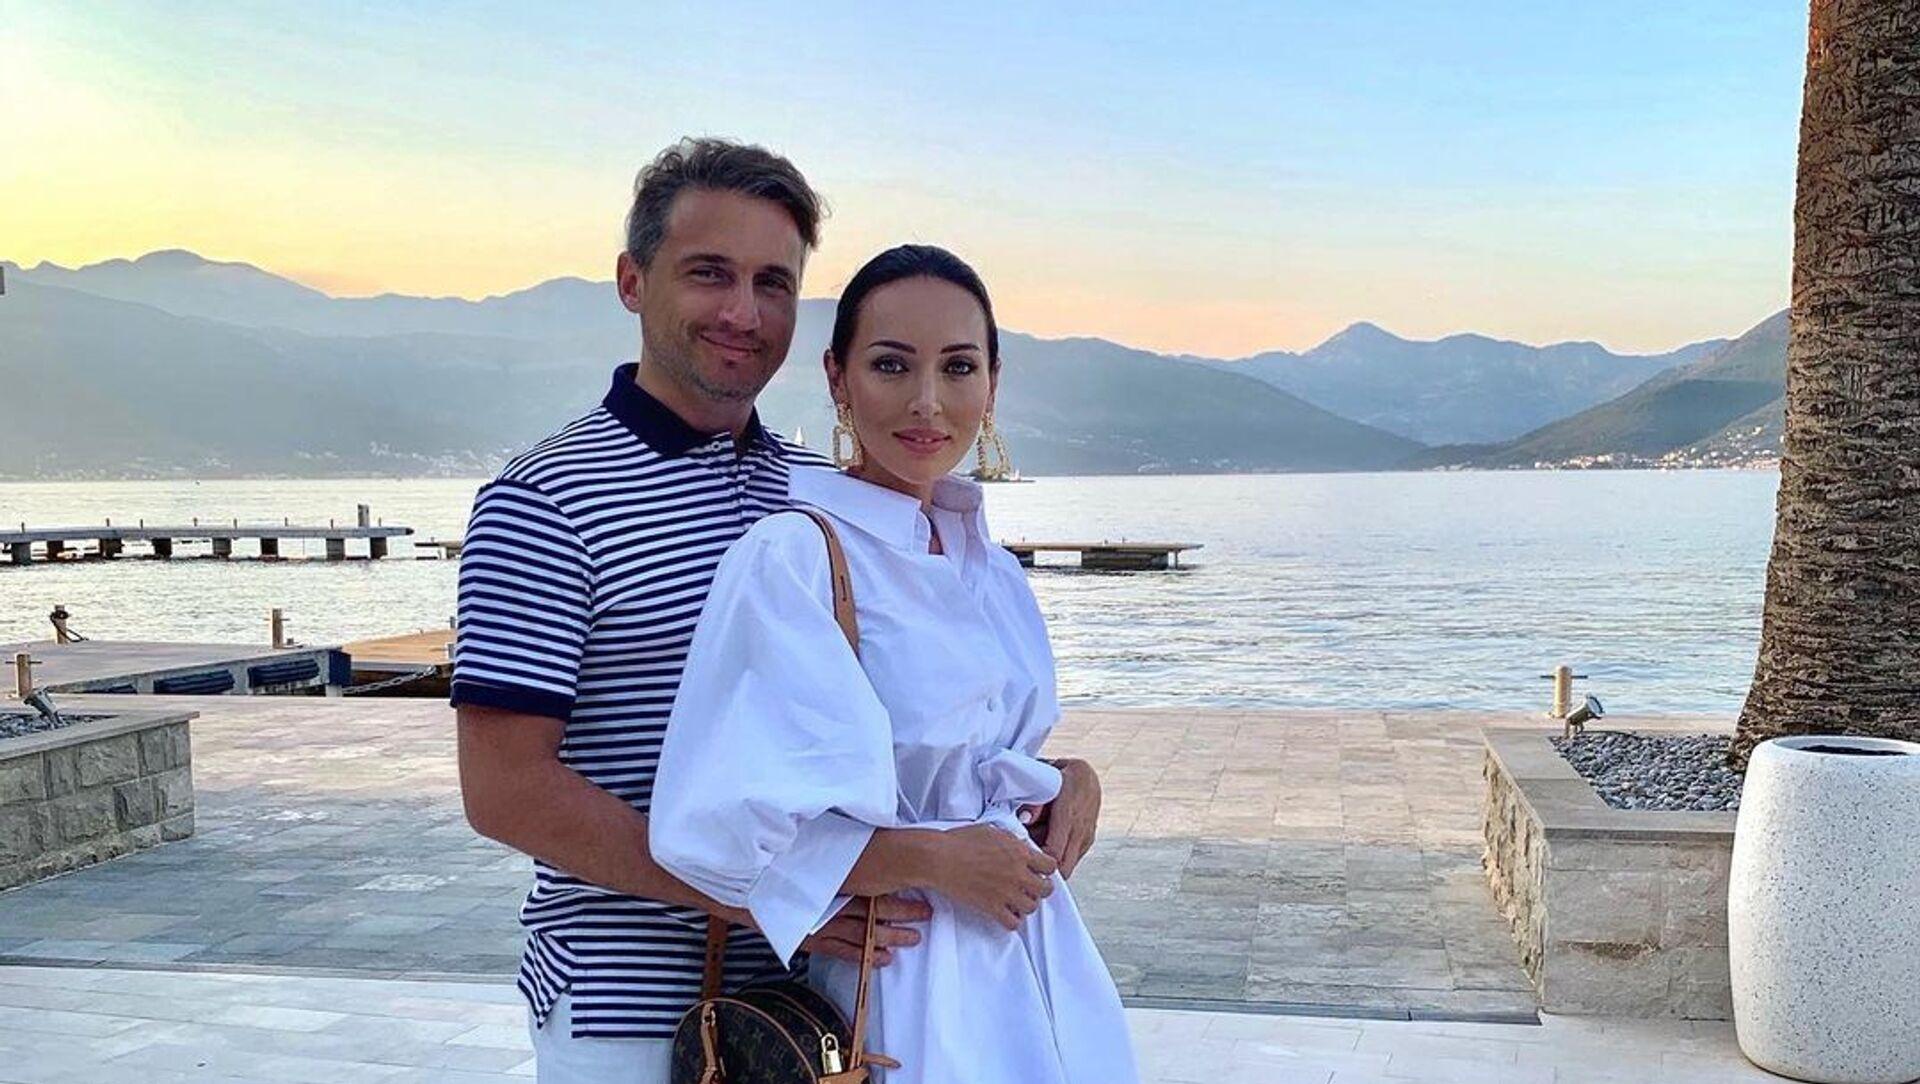 Певица Алсу вместе со своим супругом-бакинцем Яном Абрамовым - Sputnik Азербайджан, 1920, 31.07.2021